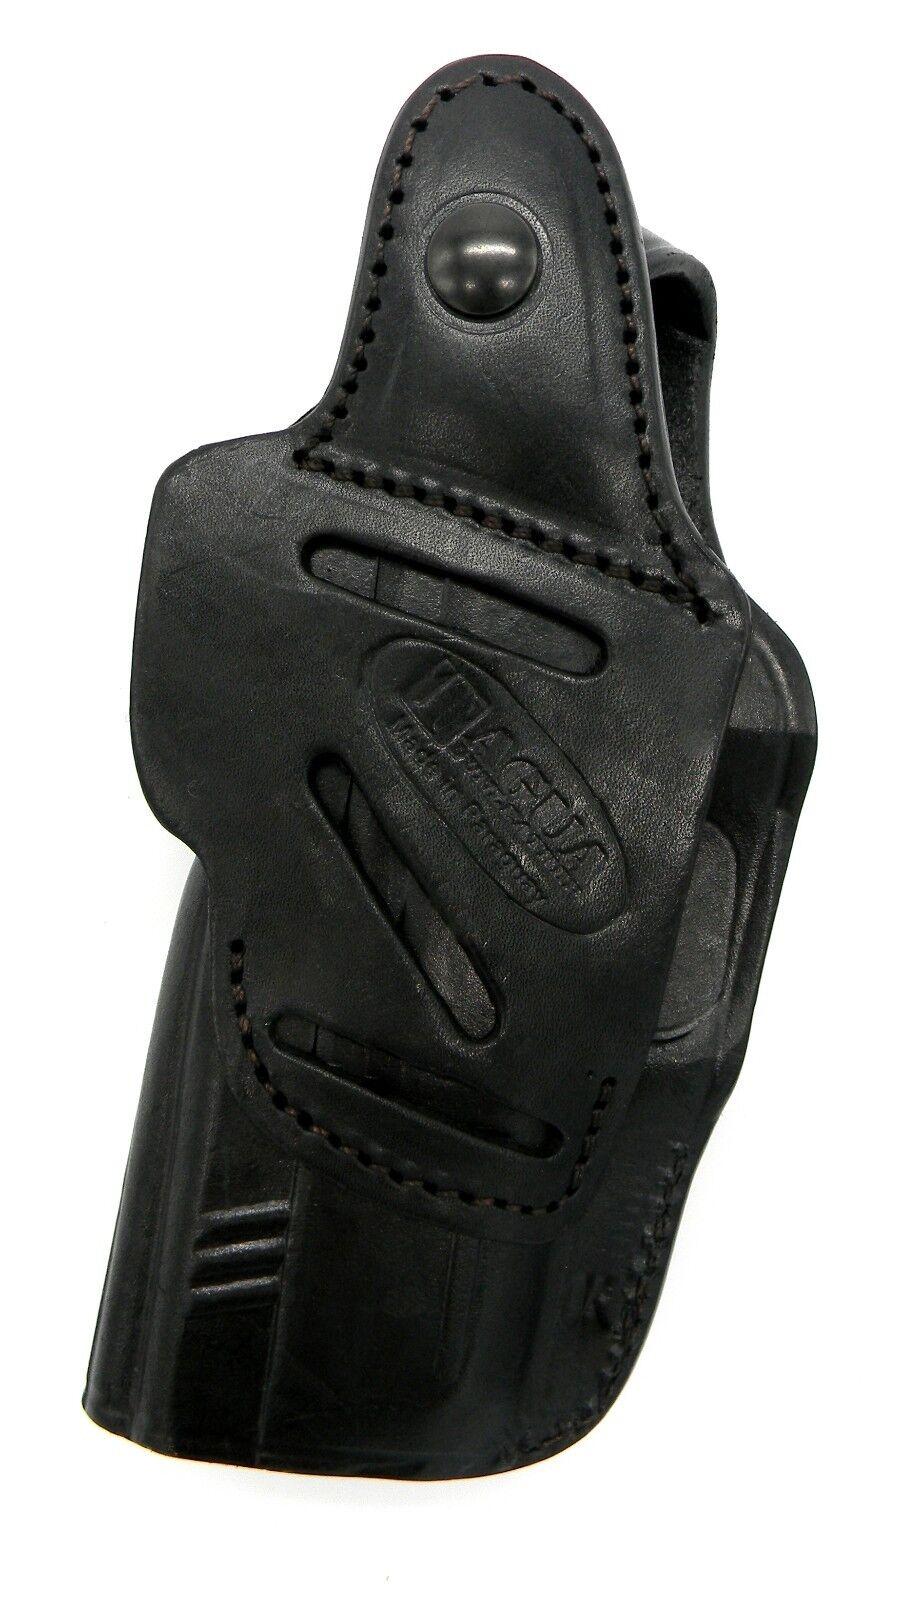 TAGUA BLACK LEATHER 4 in 1 OWB IWB SOB THUMB BREAK HOLSTER RUGER SR9C SR40C